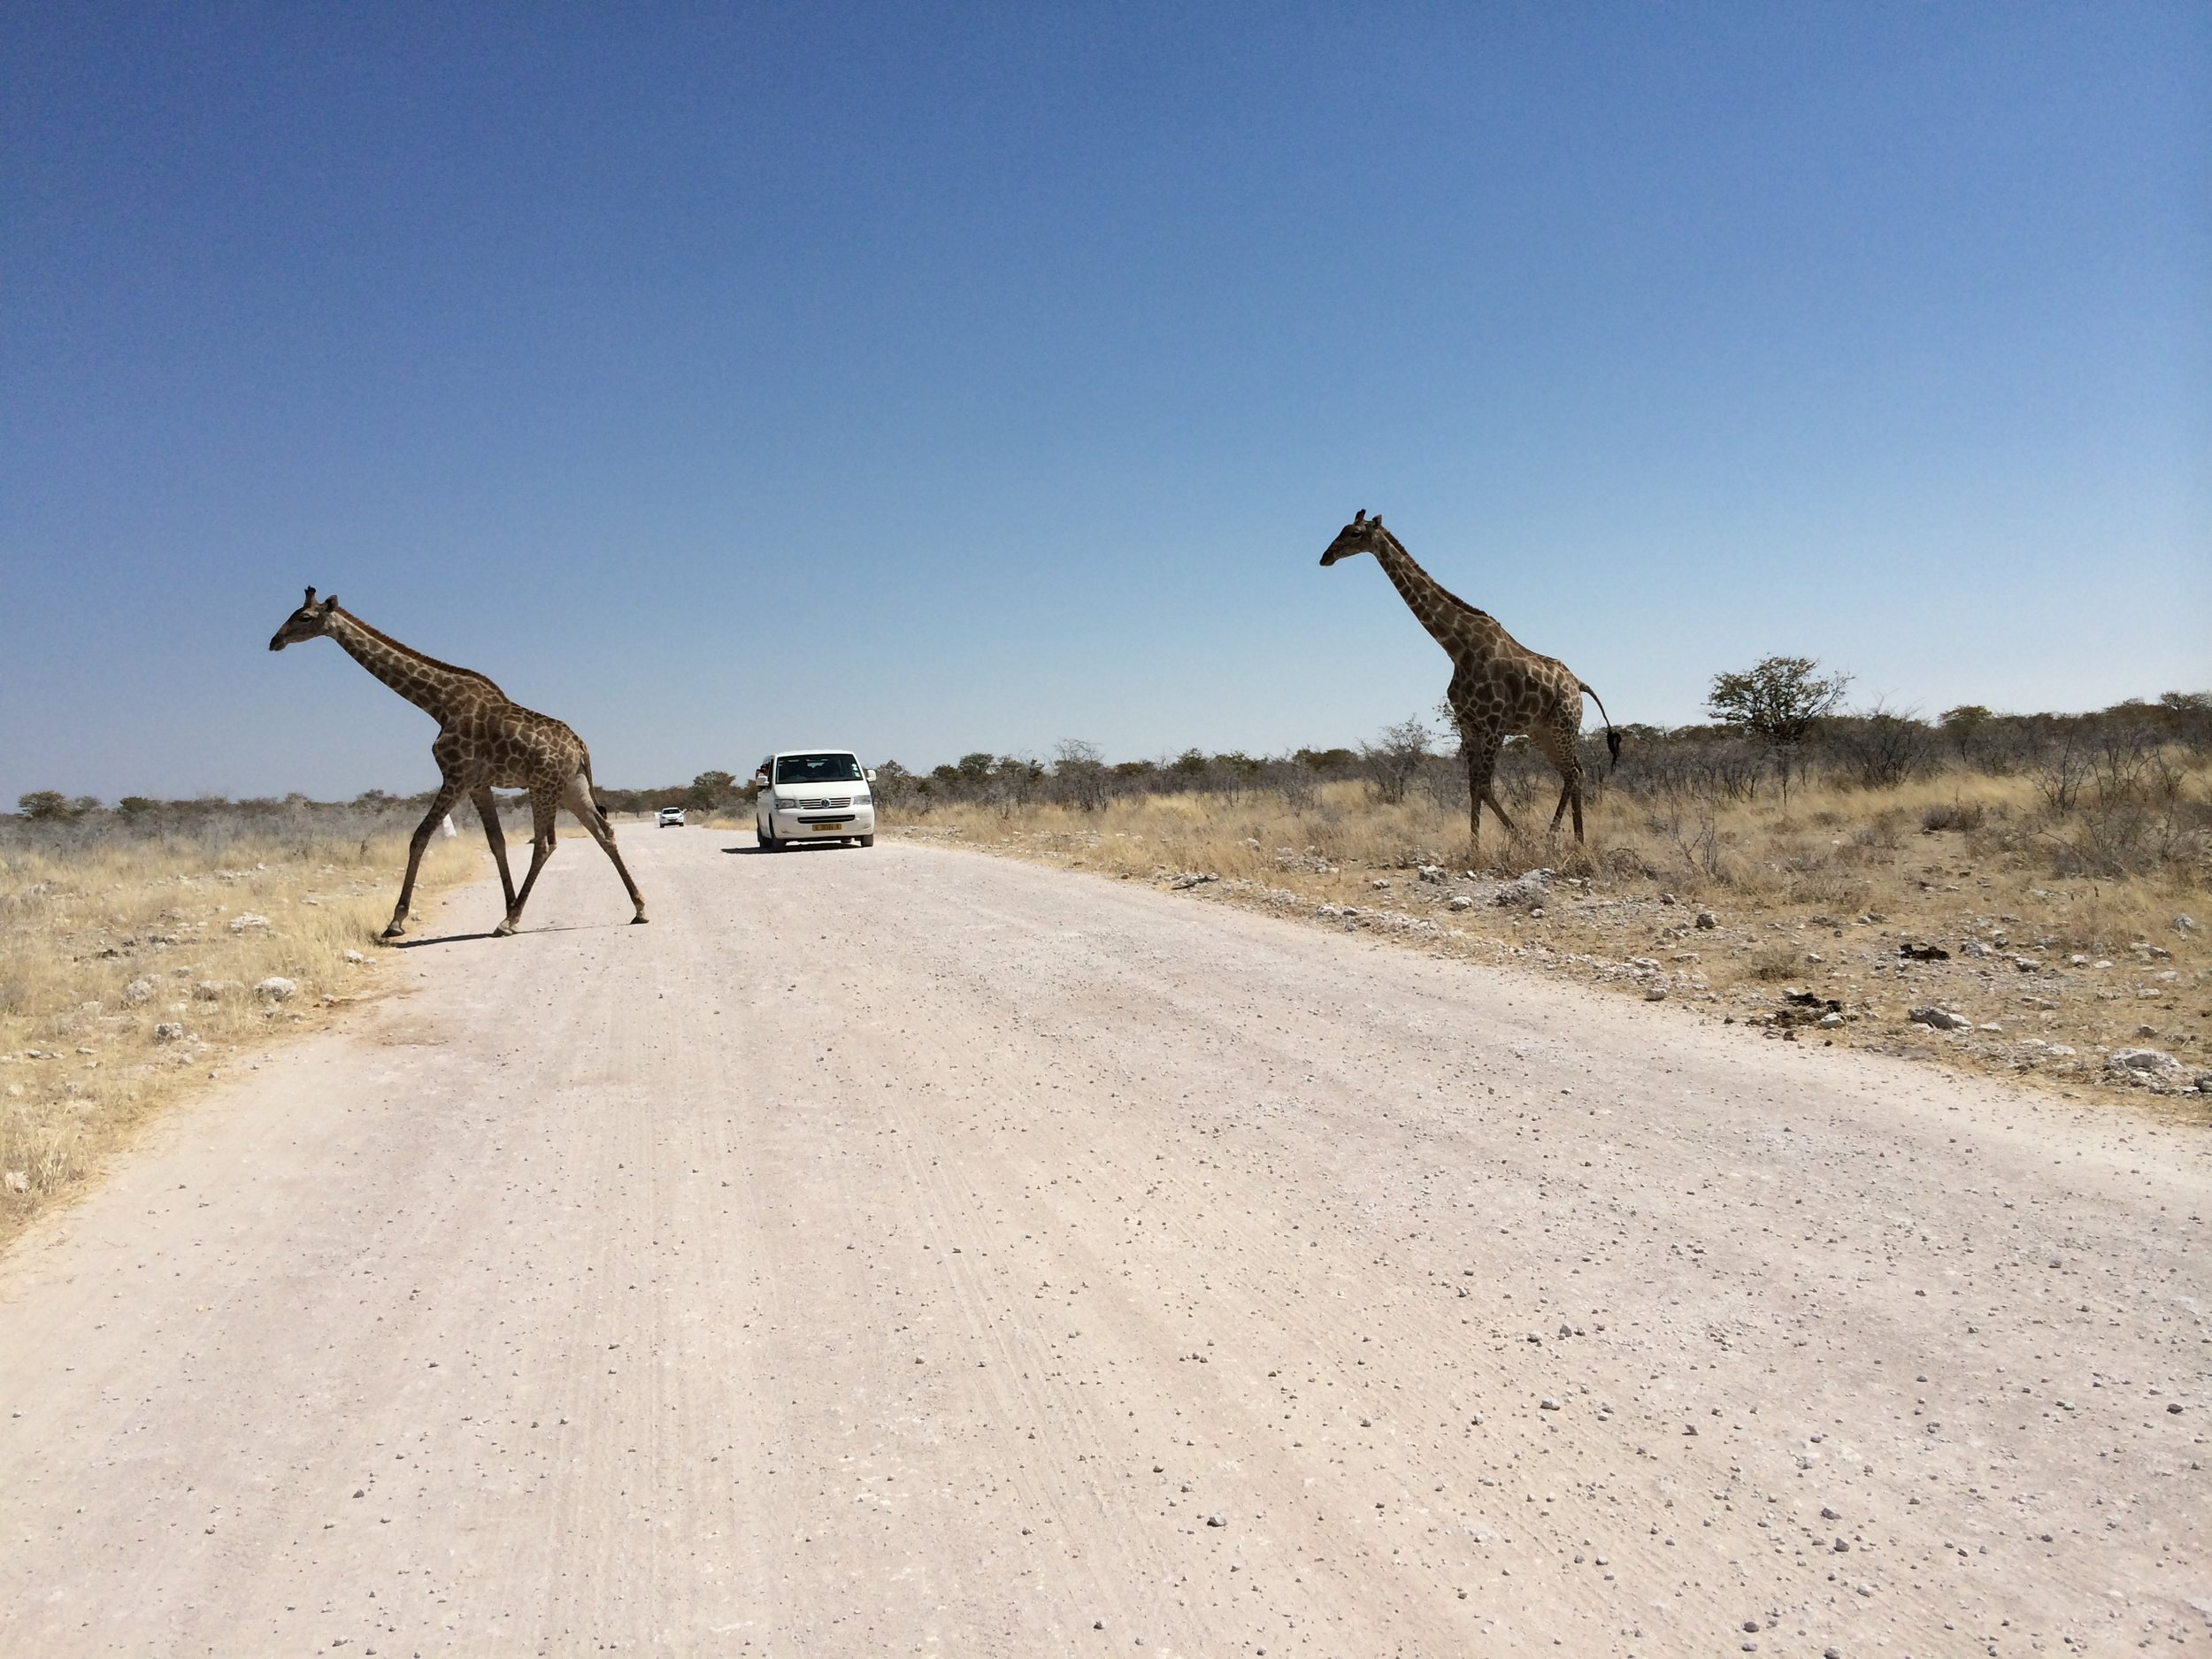 Road crossing Giraffes